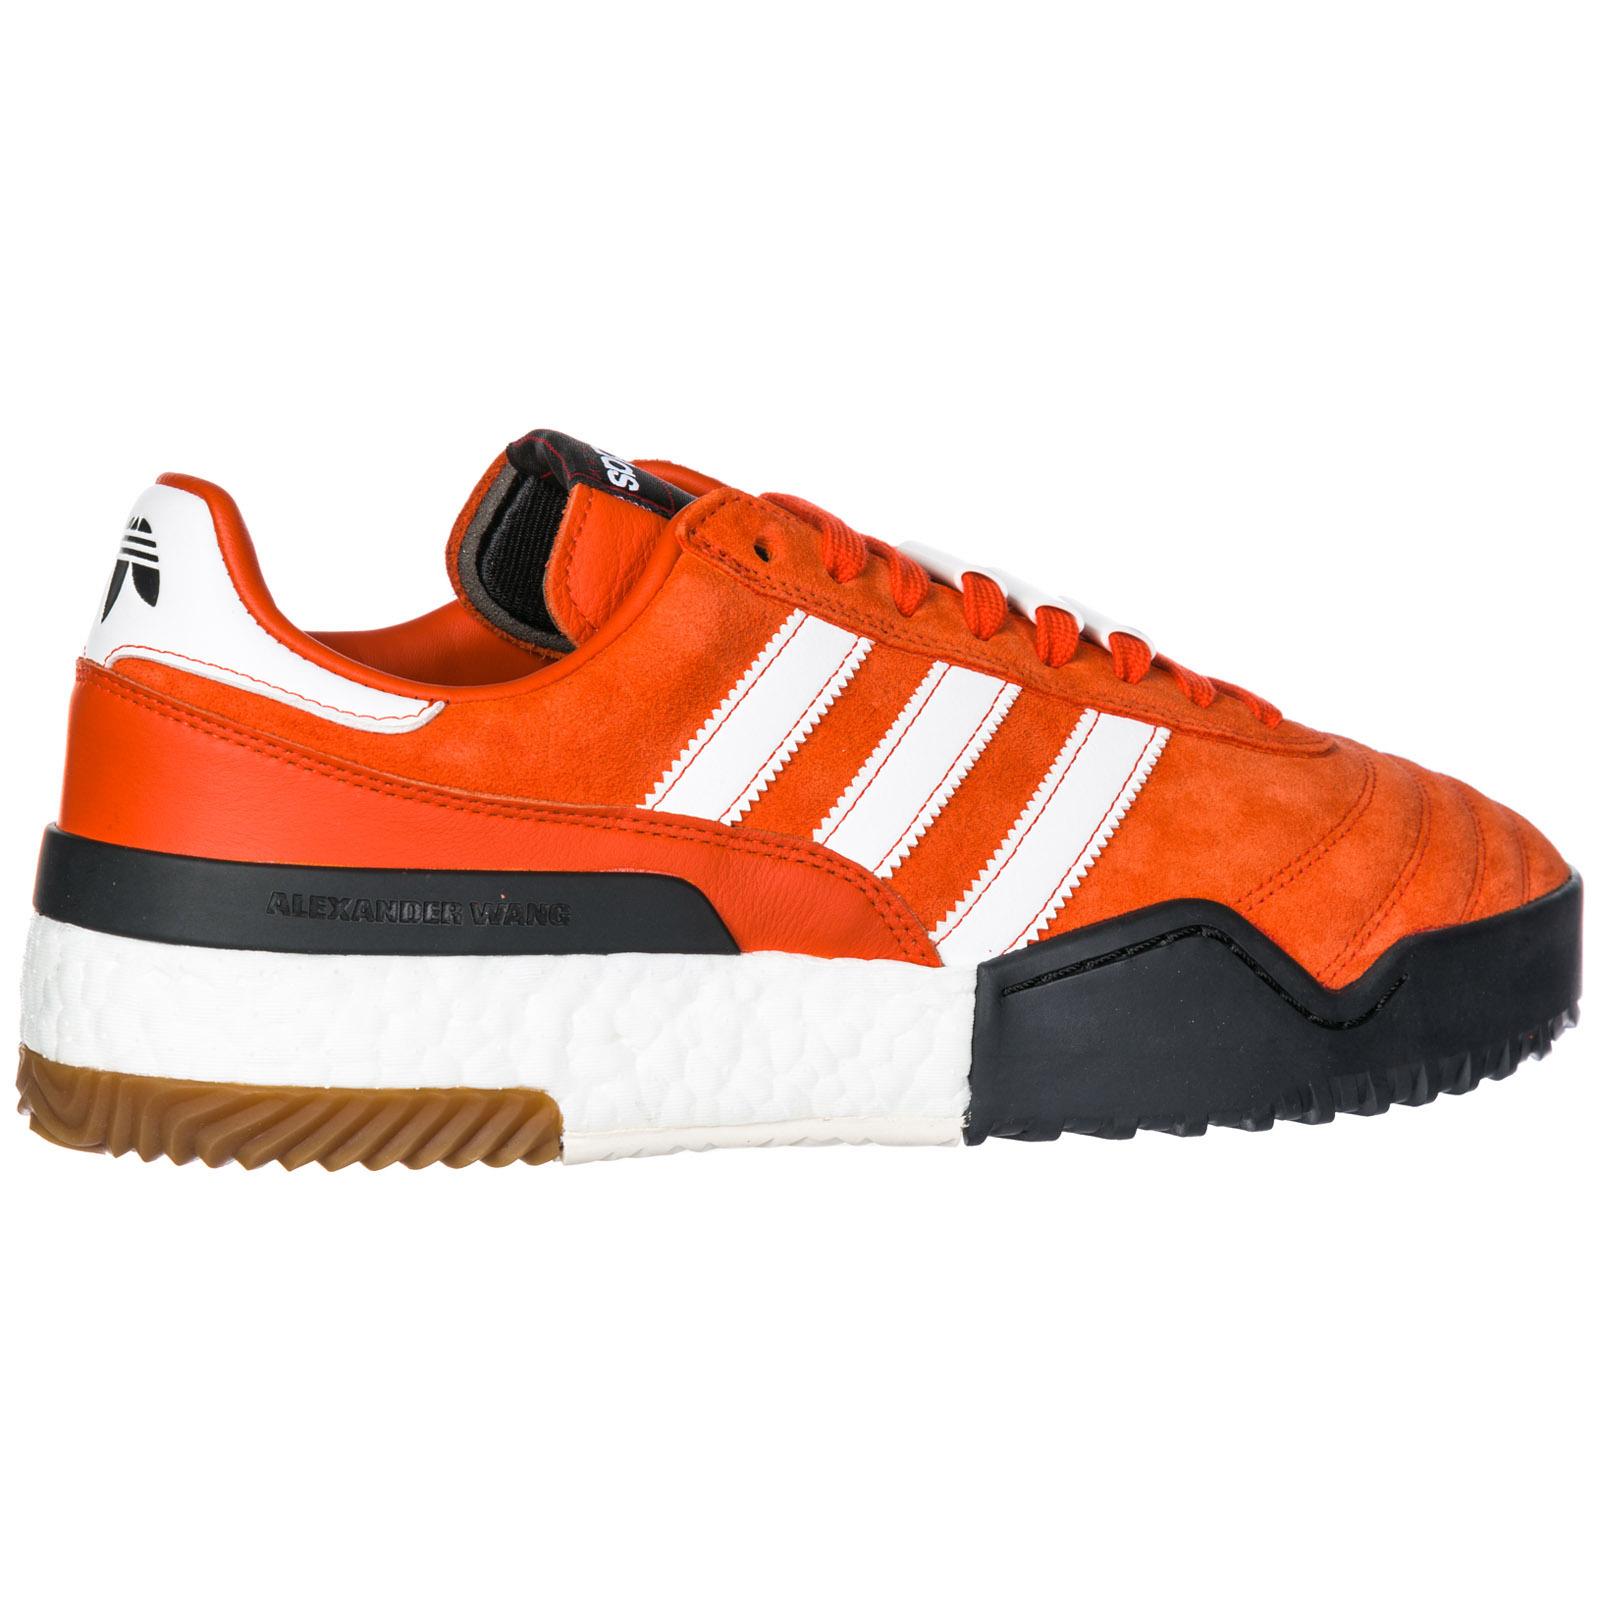 wholesale dealer 6b07f 21641 ... Scarpe sneakers uomo camoscio aw bball soccer ...